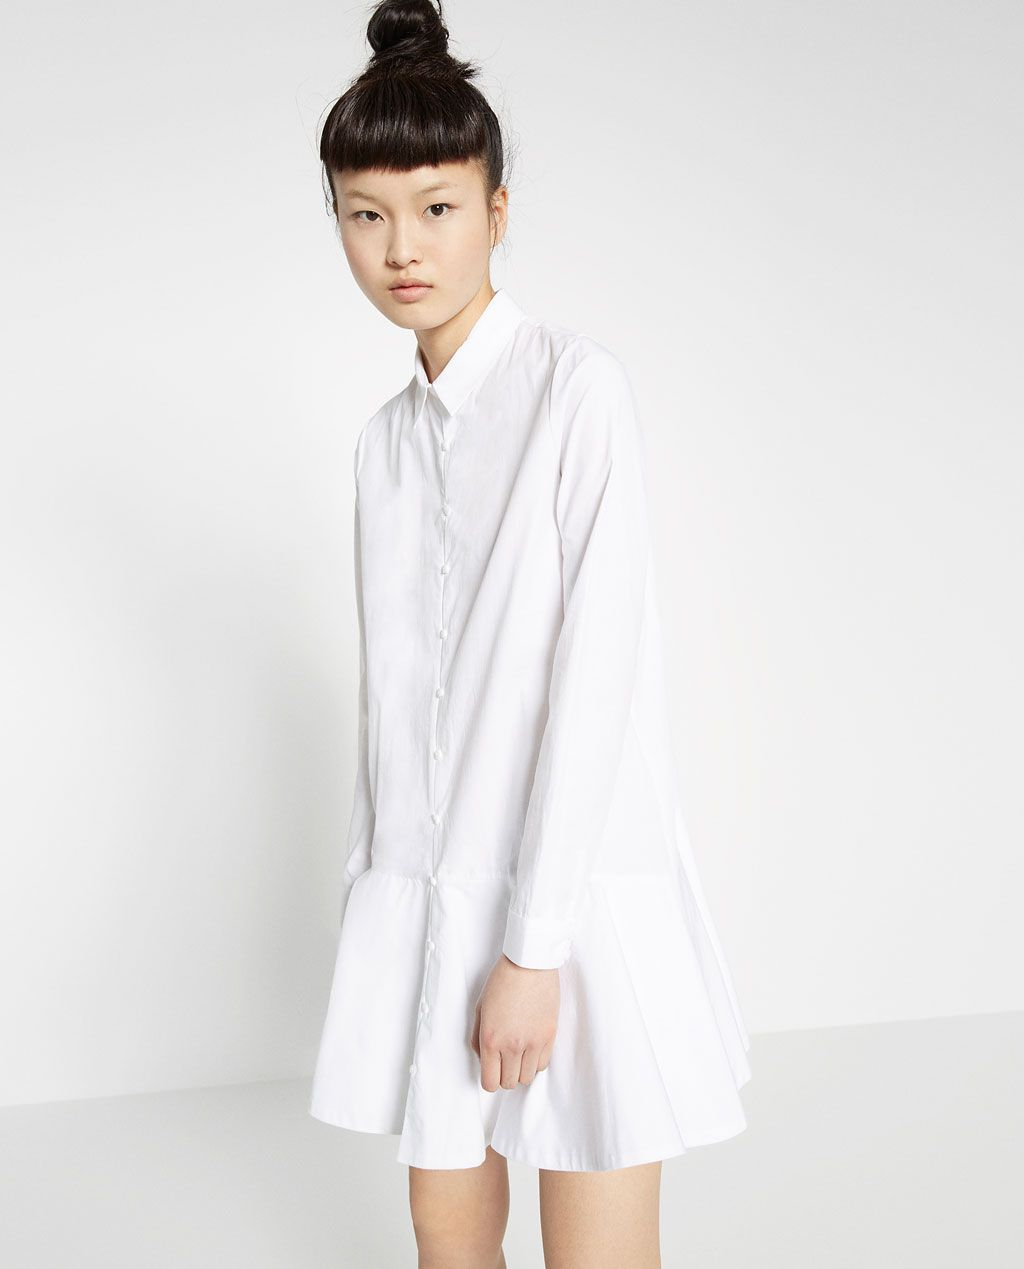 0b532c2ef Image 2 of SHIRT DRESS from Zara | style | Zara shirt, Shirt dress ...